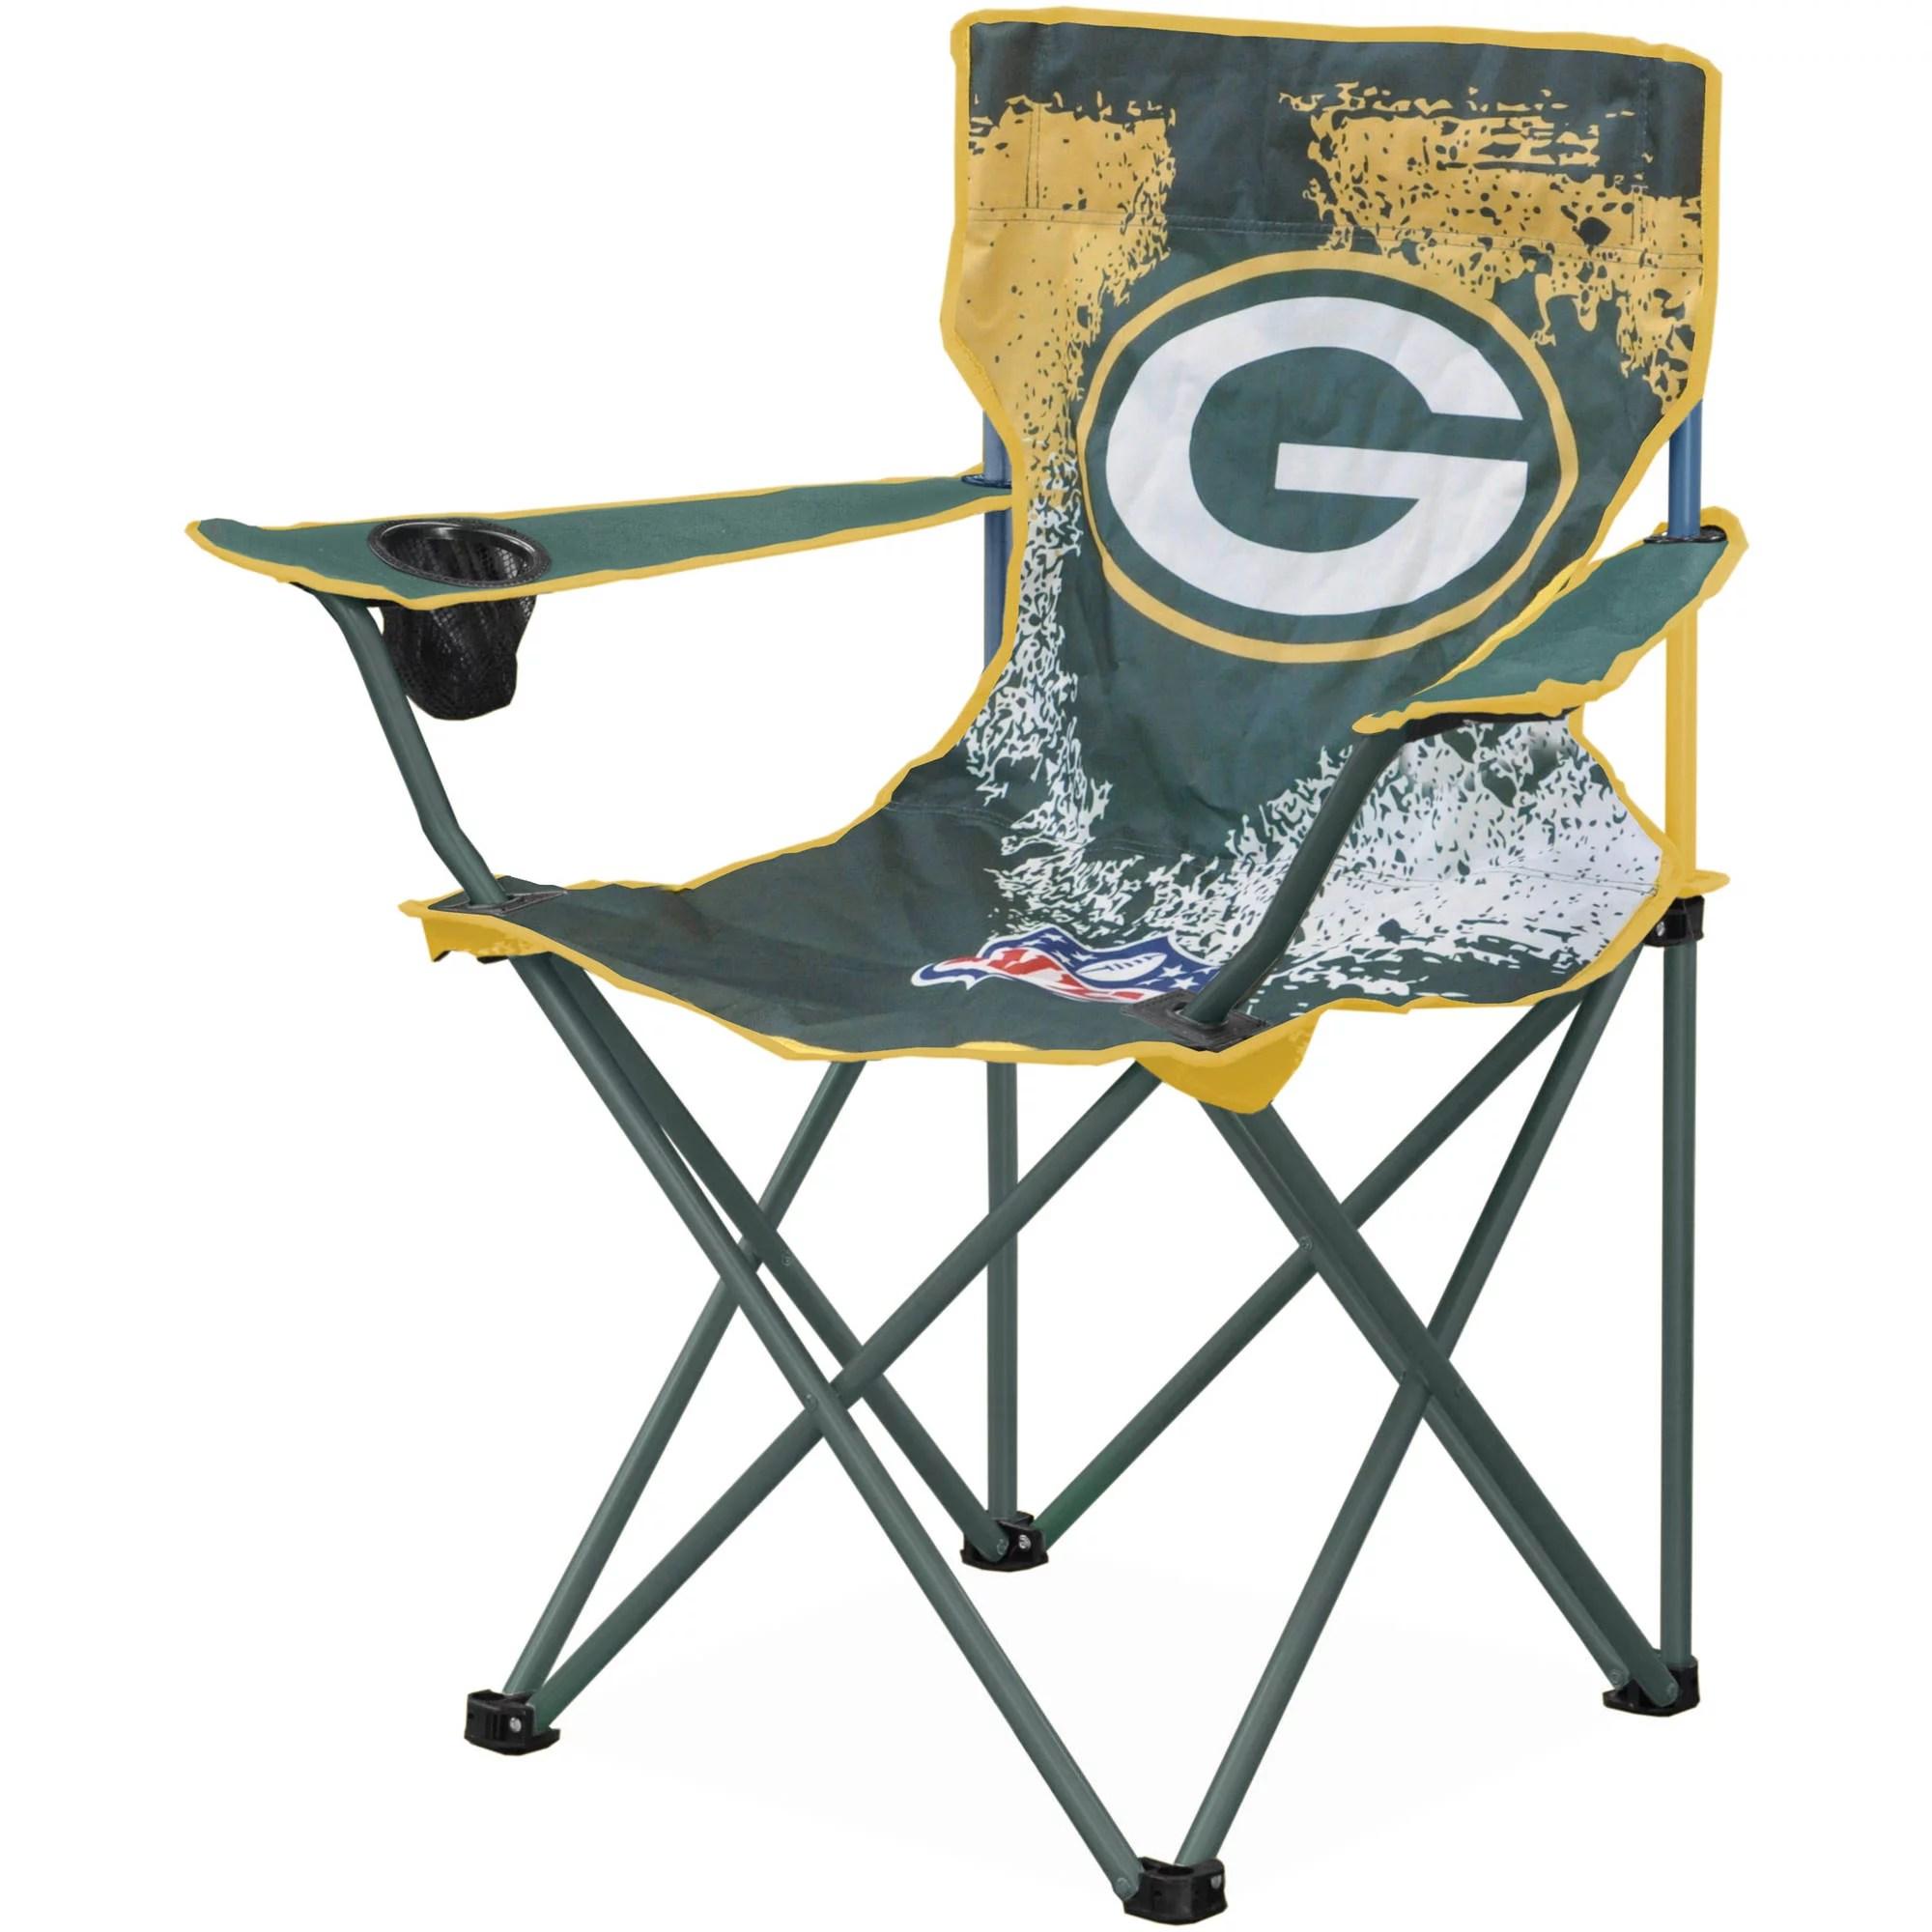 green bay packers chair custom outdoor cushions covers nfl tween camp walmart com